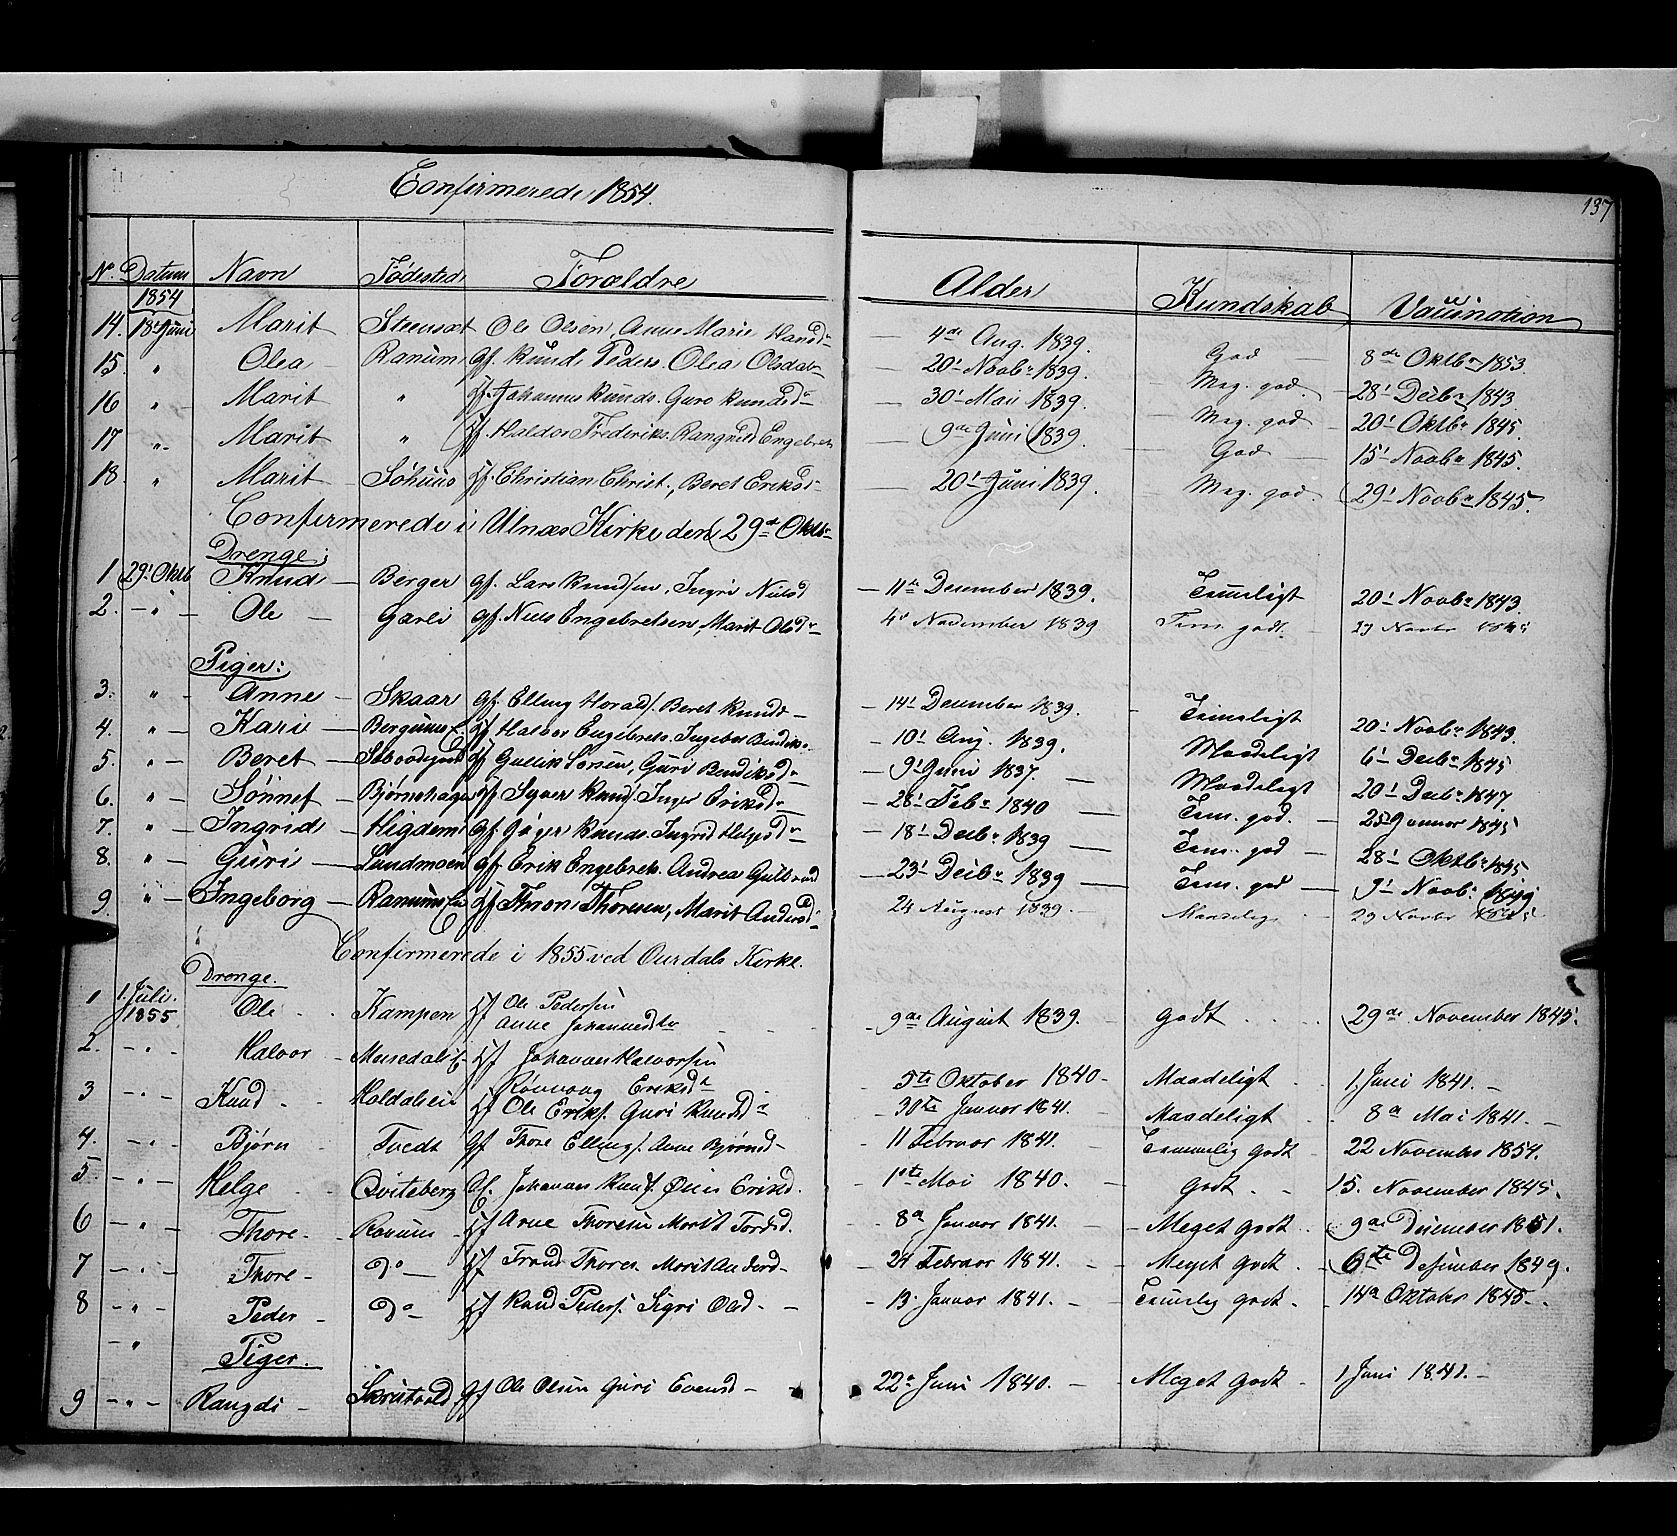 SAH, Nord-Aurdal prestekontor, Ministerialbok nr. 7, 1842-1863, s. 137